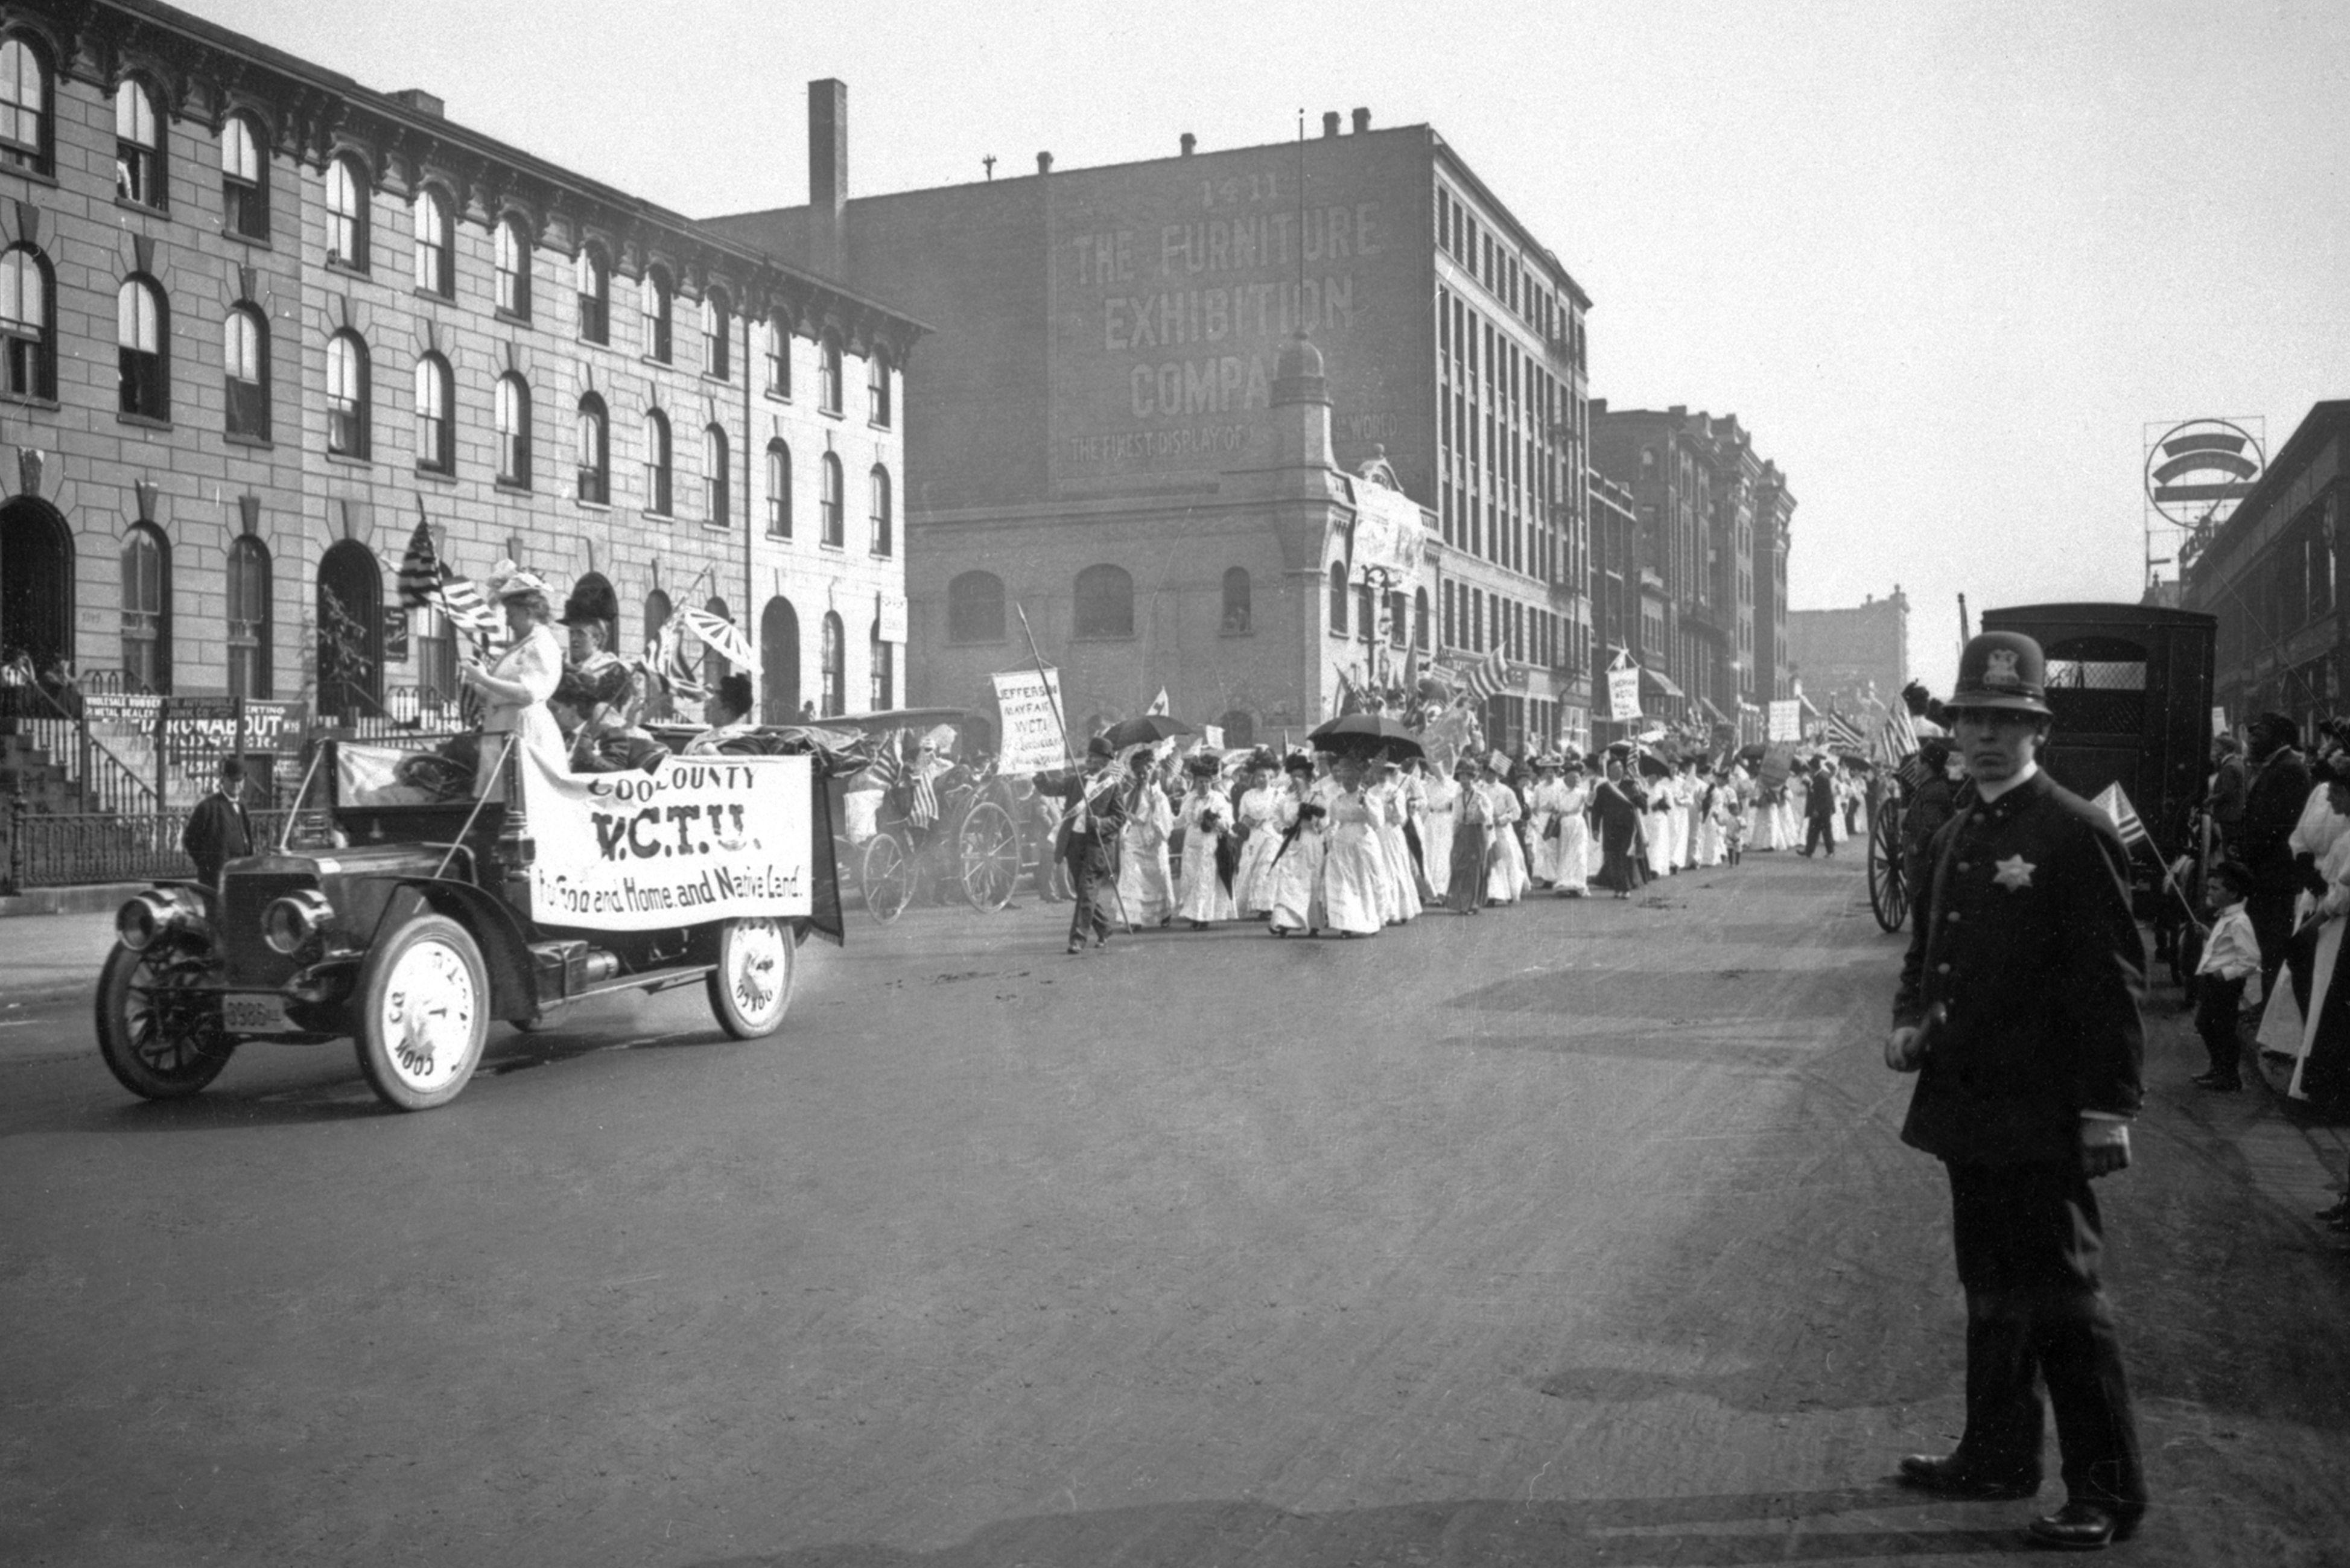 Photograph of the Temperance Parade, 1908, Chicago